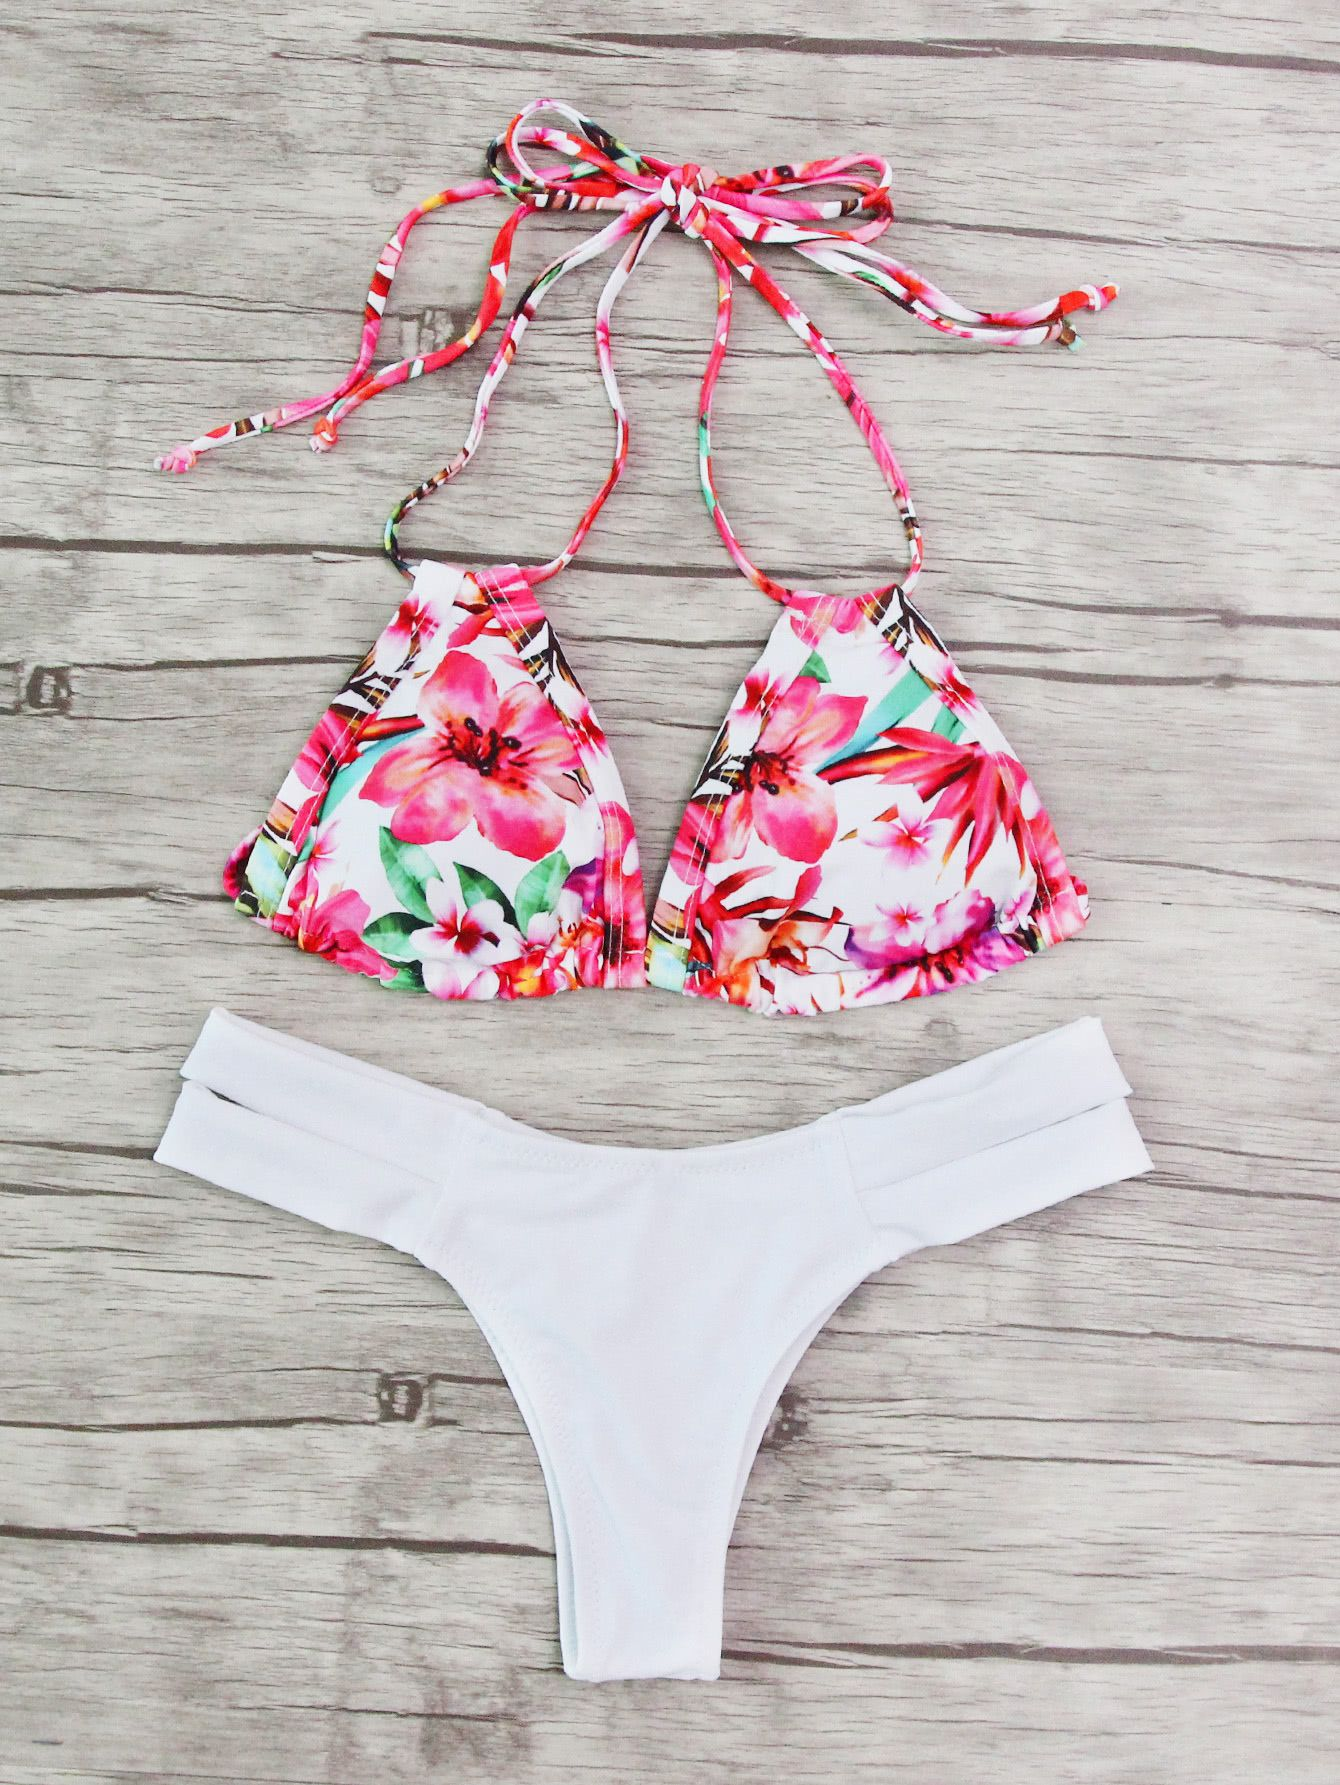 62977f52b1 Shop Calico Print Mix & Match Halter Bikini Set online. SheIn offers Calico  Print Mix & Match Halter Bikini Set & more to fit your fashionable needs.